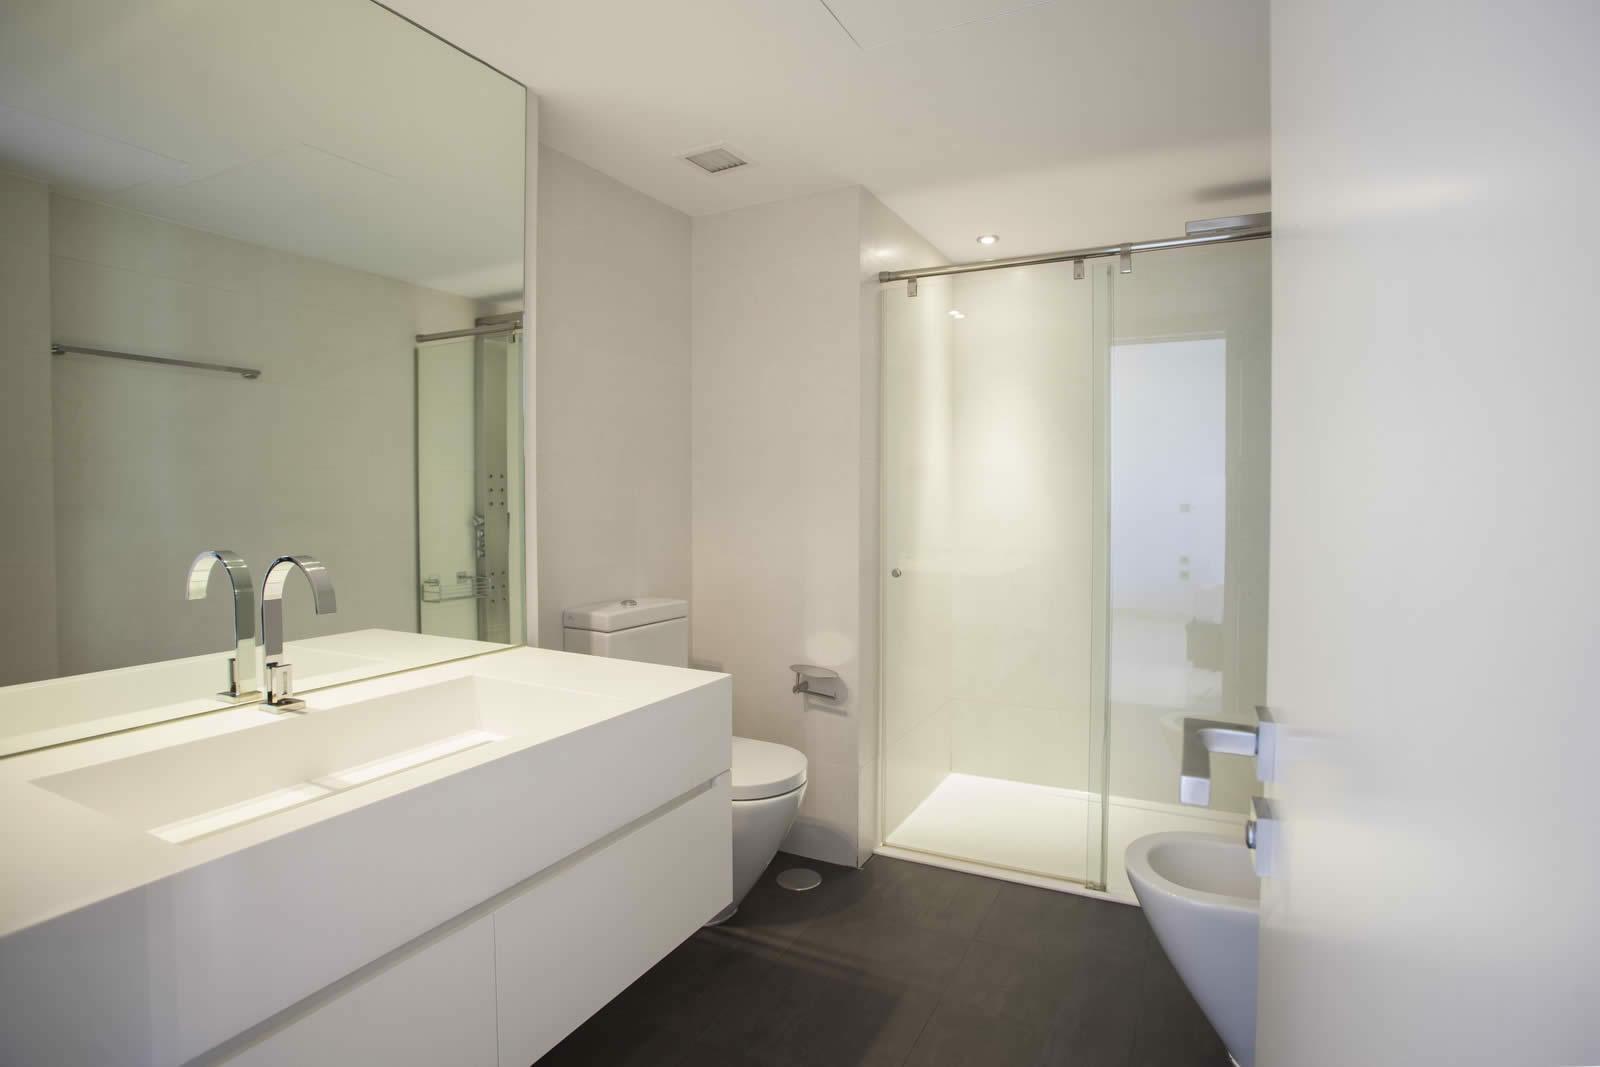 appartement-chic-elegant-decoration-neuve-luxueuse-moderne-a-vendre-rue-serrano